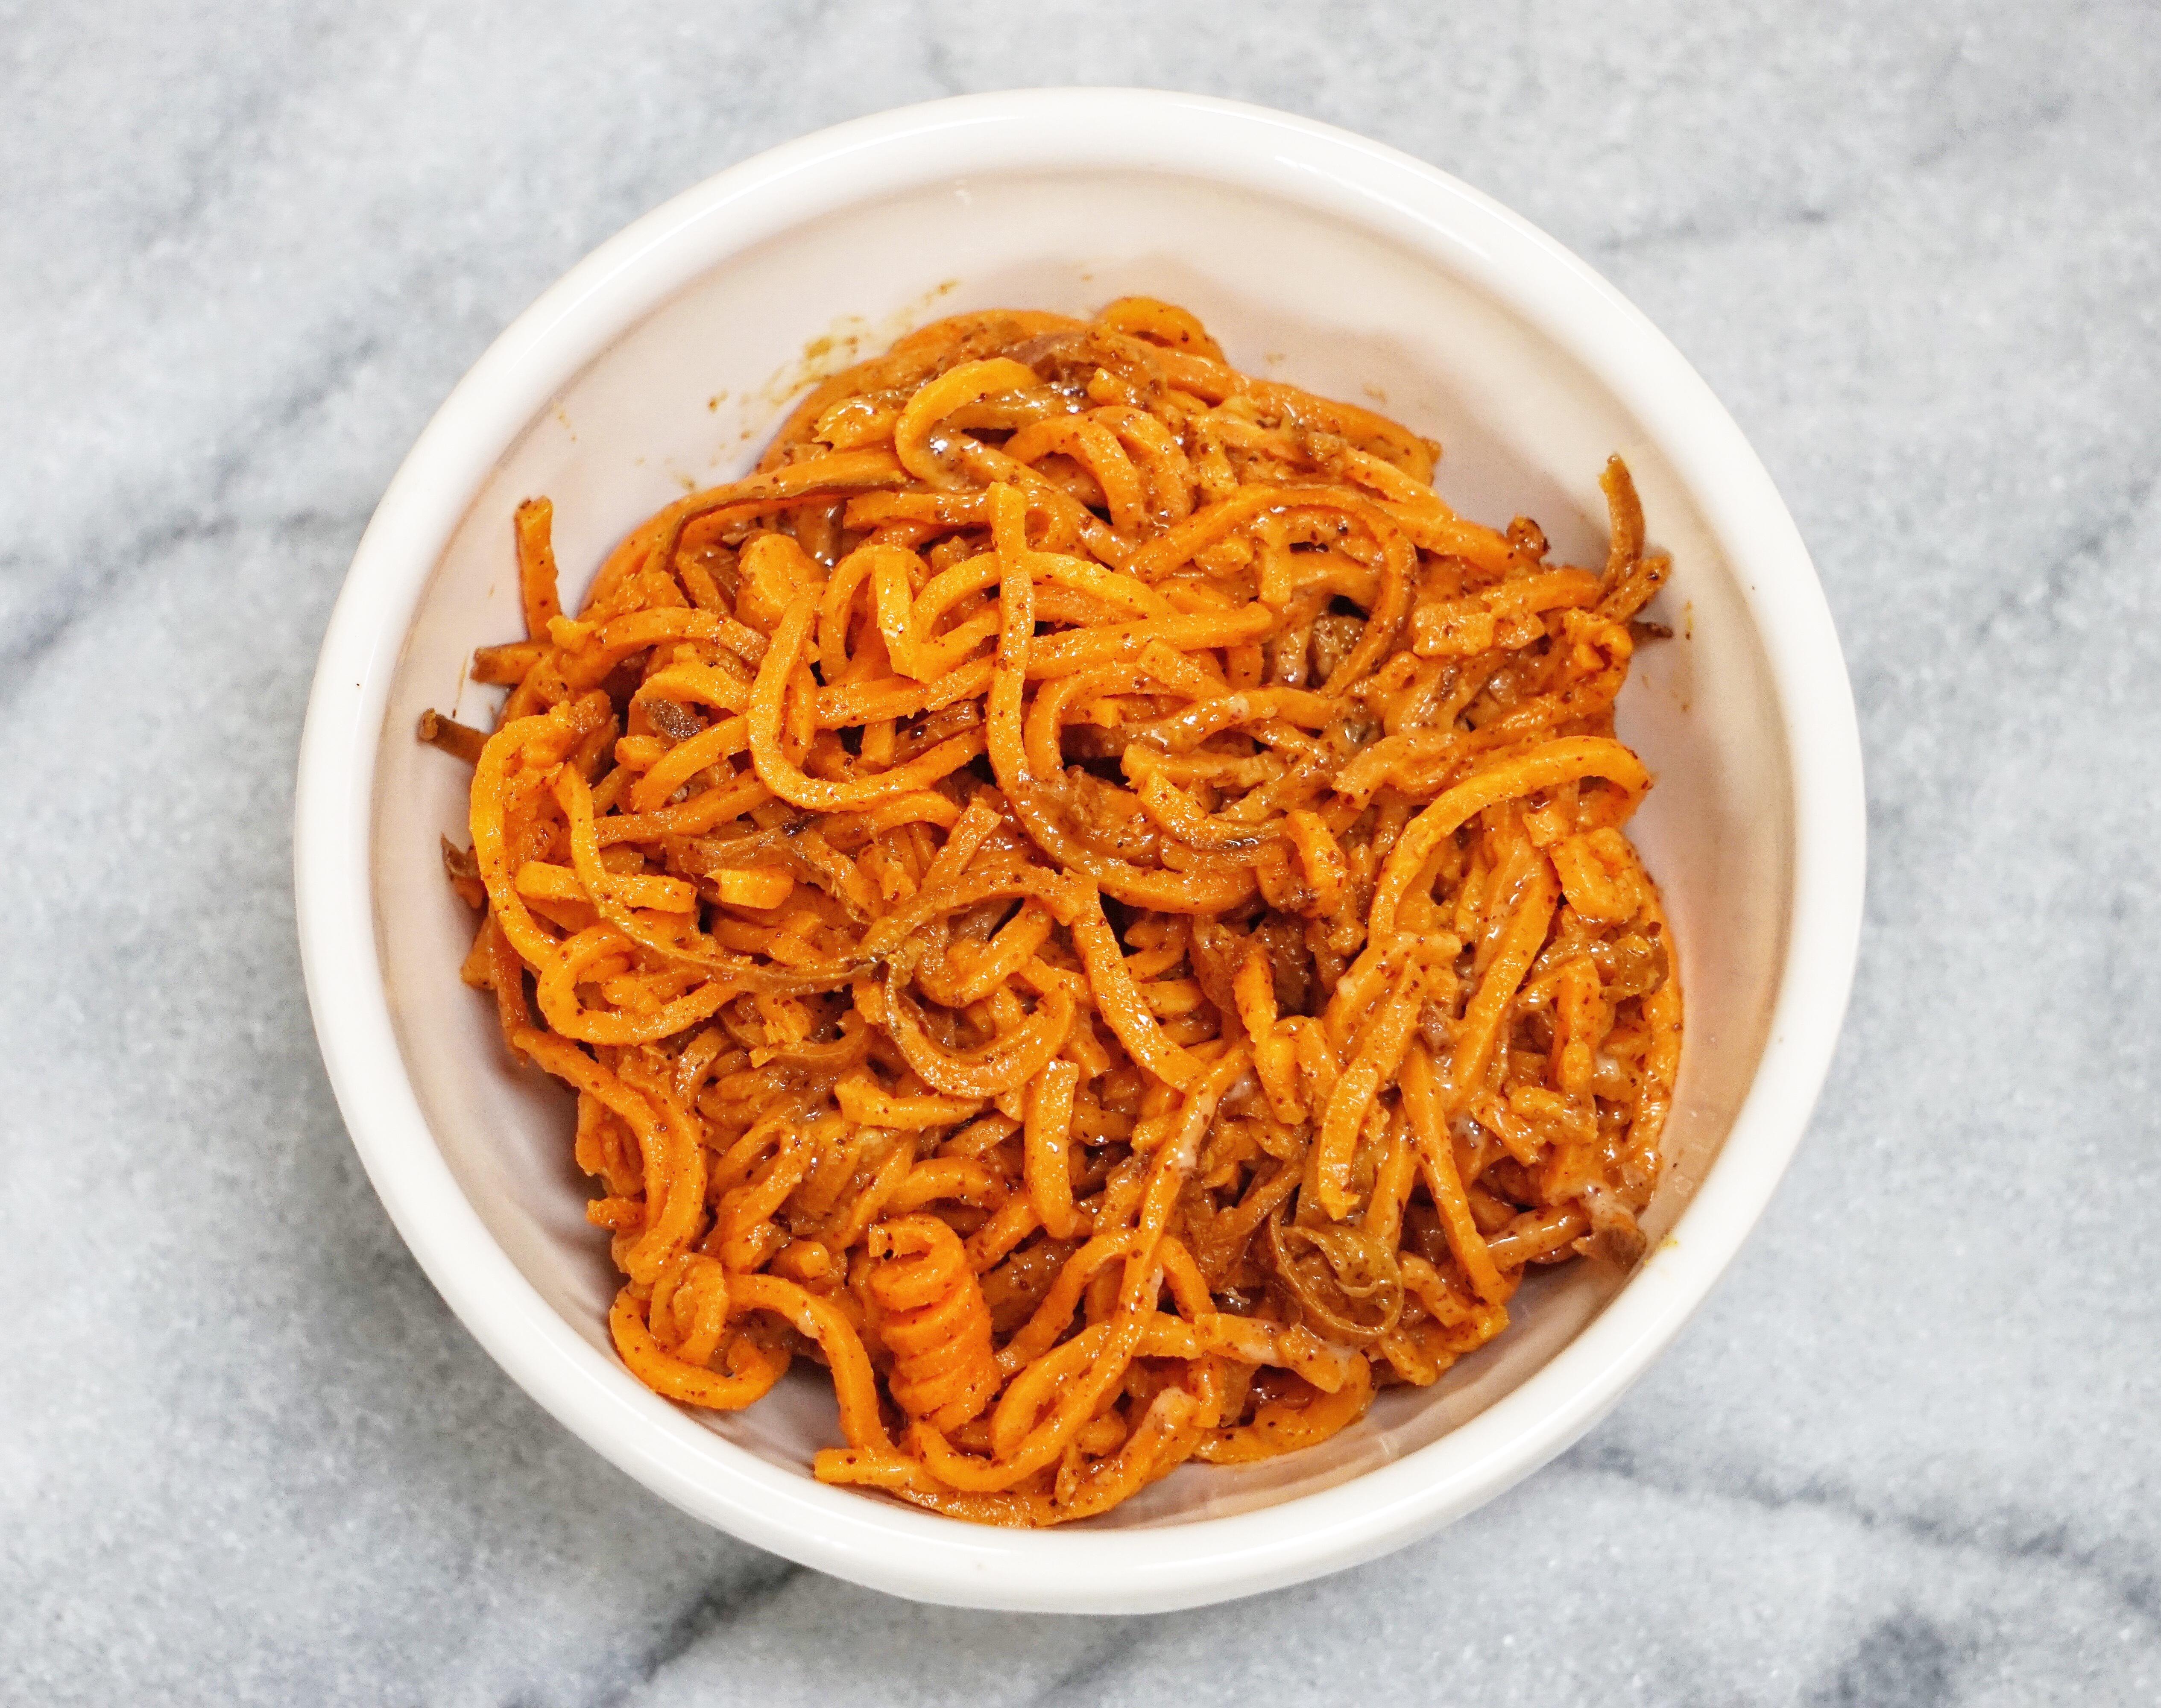 Sweet Potato Noodles with Honey Almond Butter Dressing Leahs Plate10 - Sweet Potato Noodles with a Honey Almond Butter Sauce